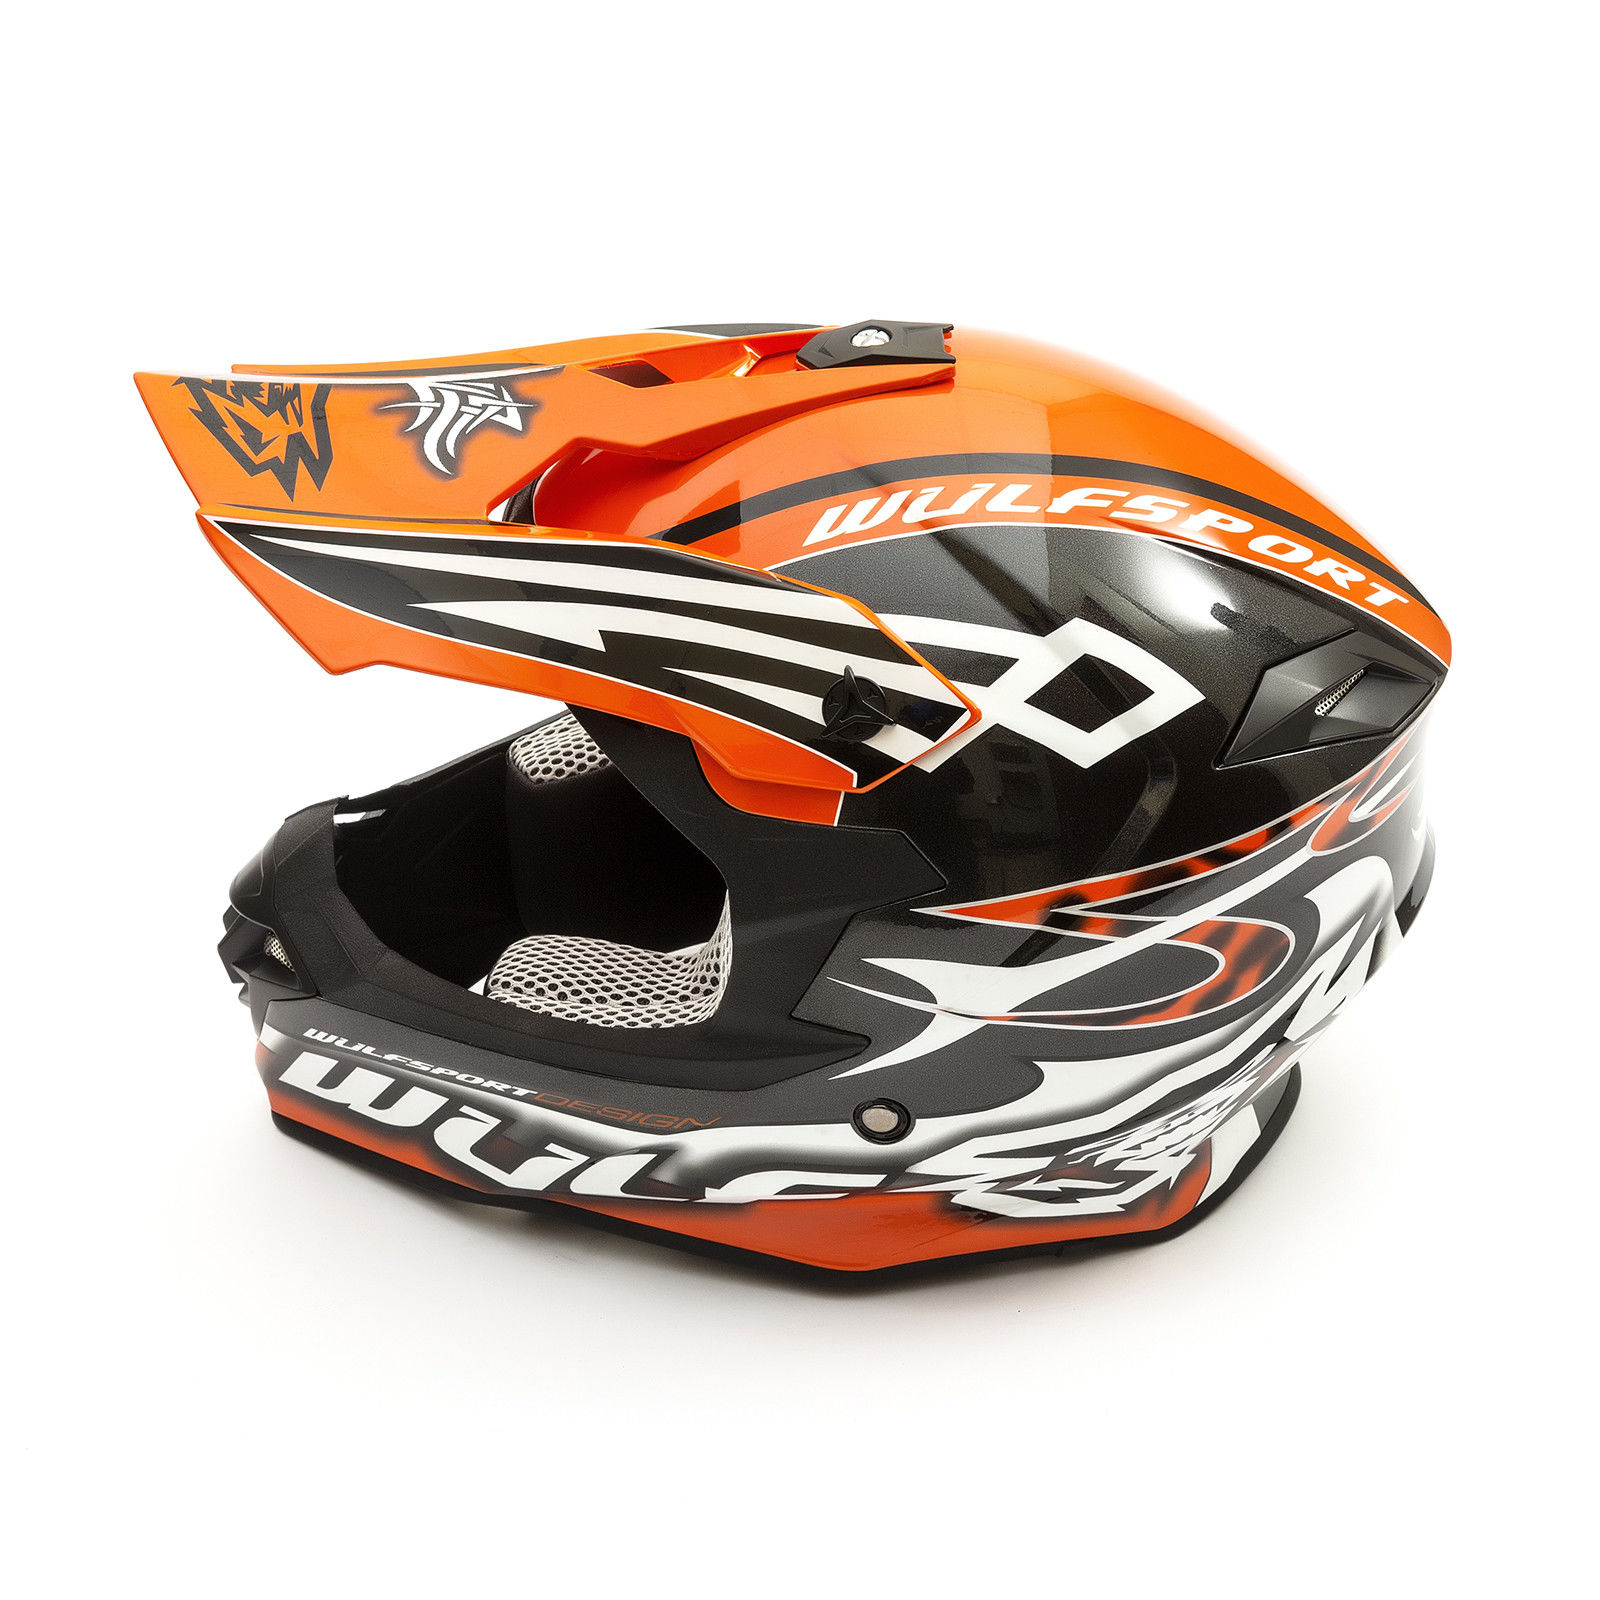 Wulfsport-Adult-Sceptre-Helmets-Motocross-Pitbike-Motorbike-Off-Road-Racing-ATV thumbnail 76